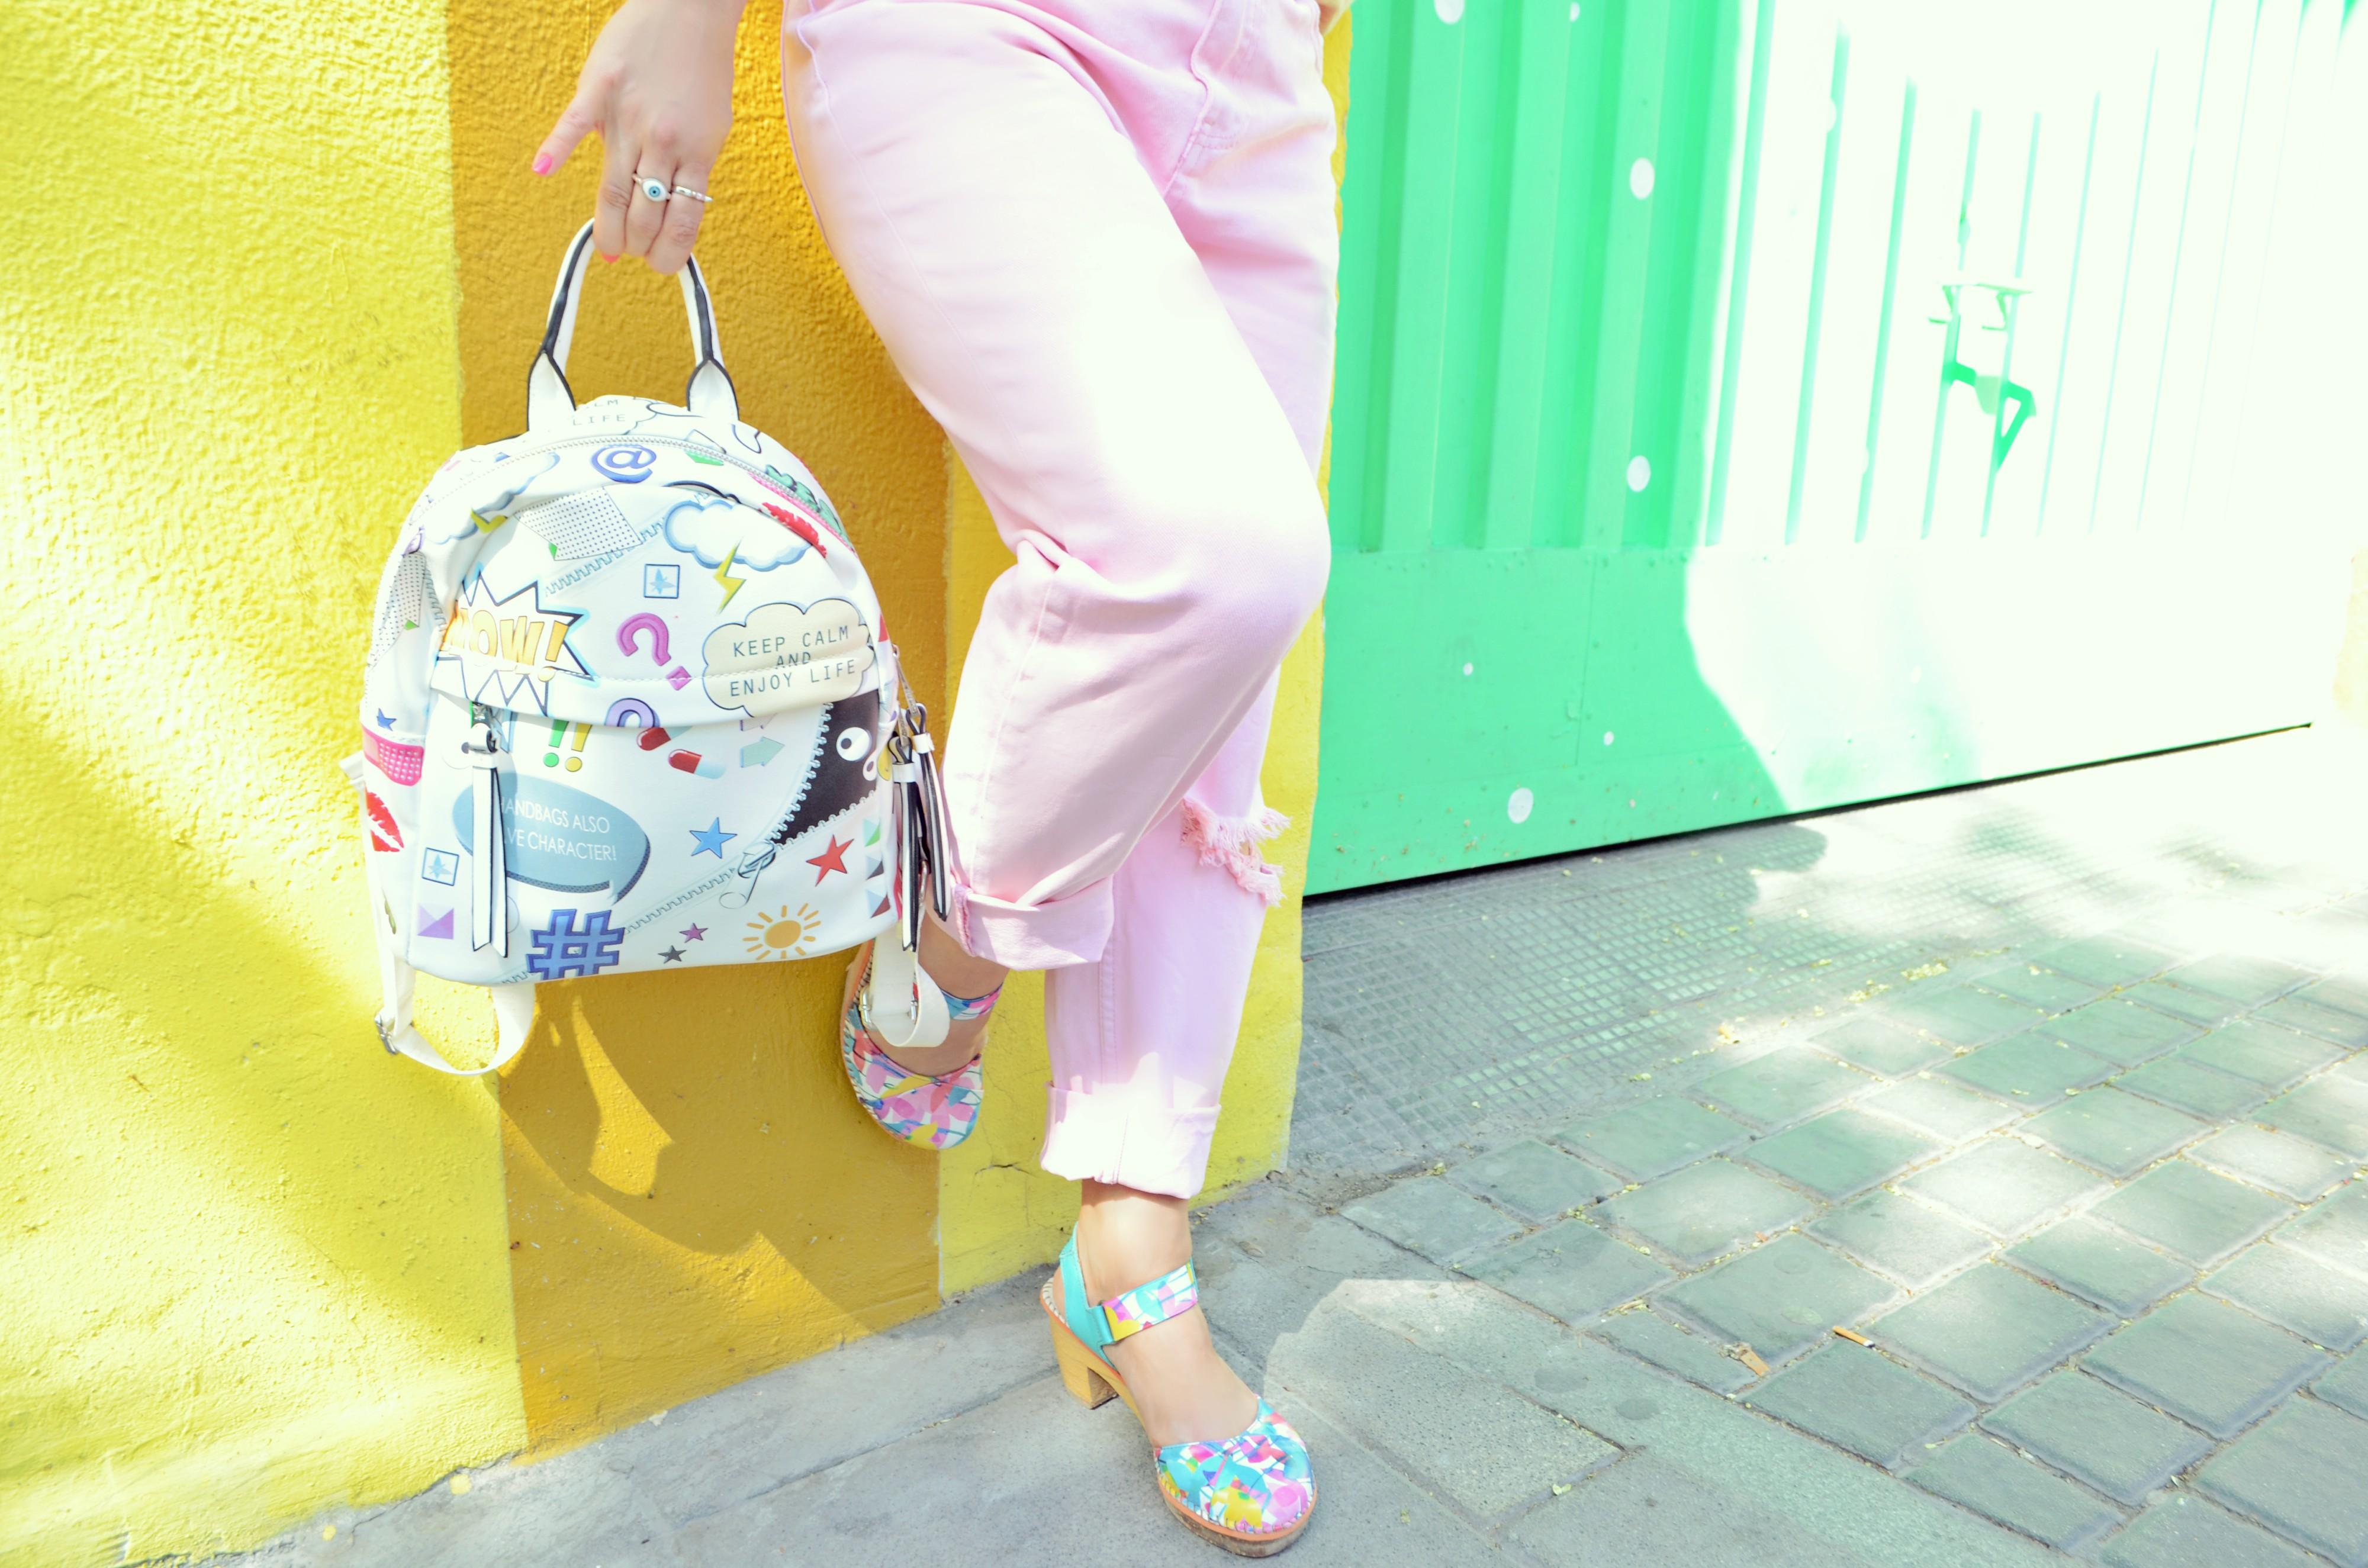 Zapatos-the-art-company-bolsos-pepemoll-ChicAdicta-fashionista-Chic-Adicta-vaqueros-rosa-influencer-espana-fun-style-PiensaenChic-Piensa-en-Chic